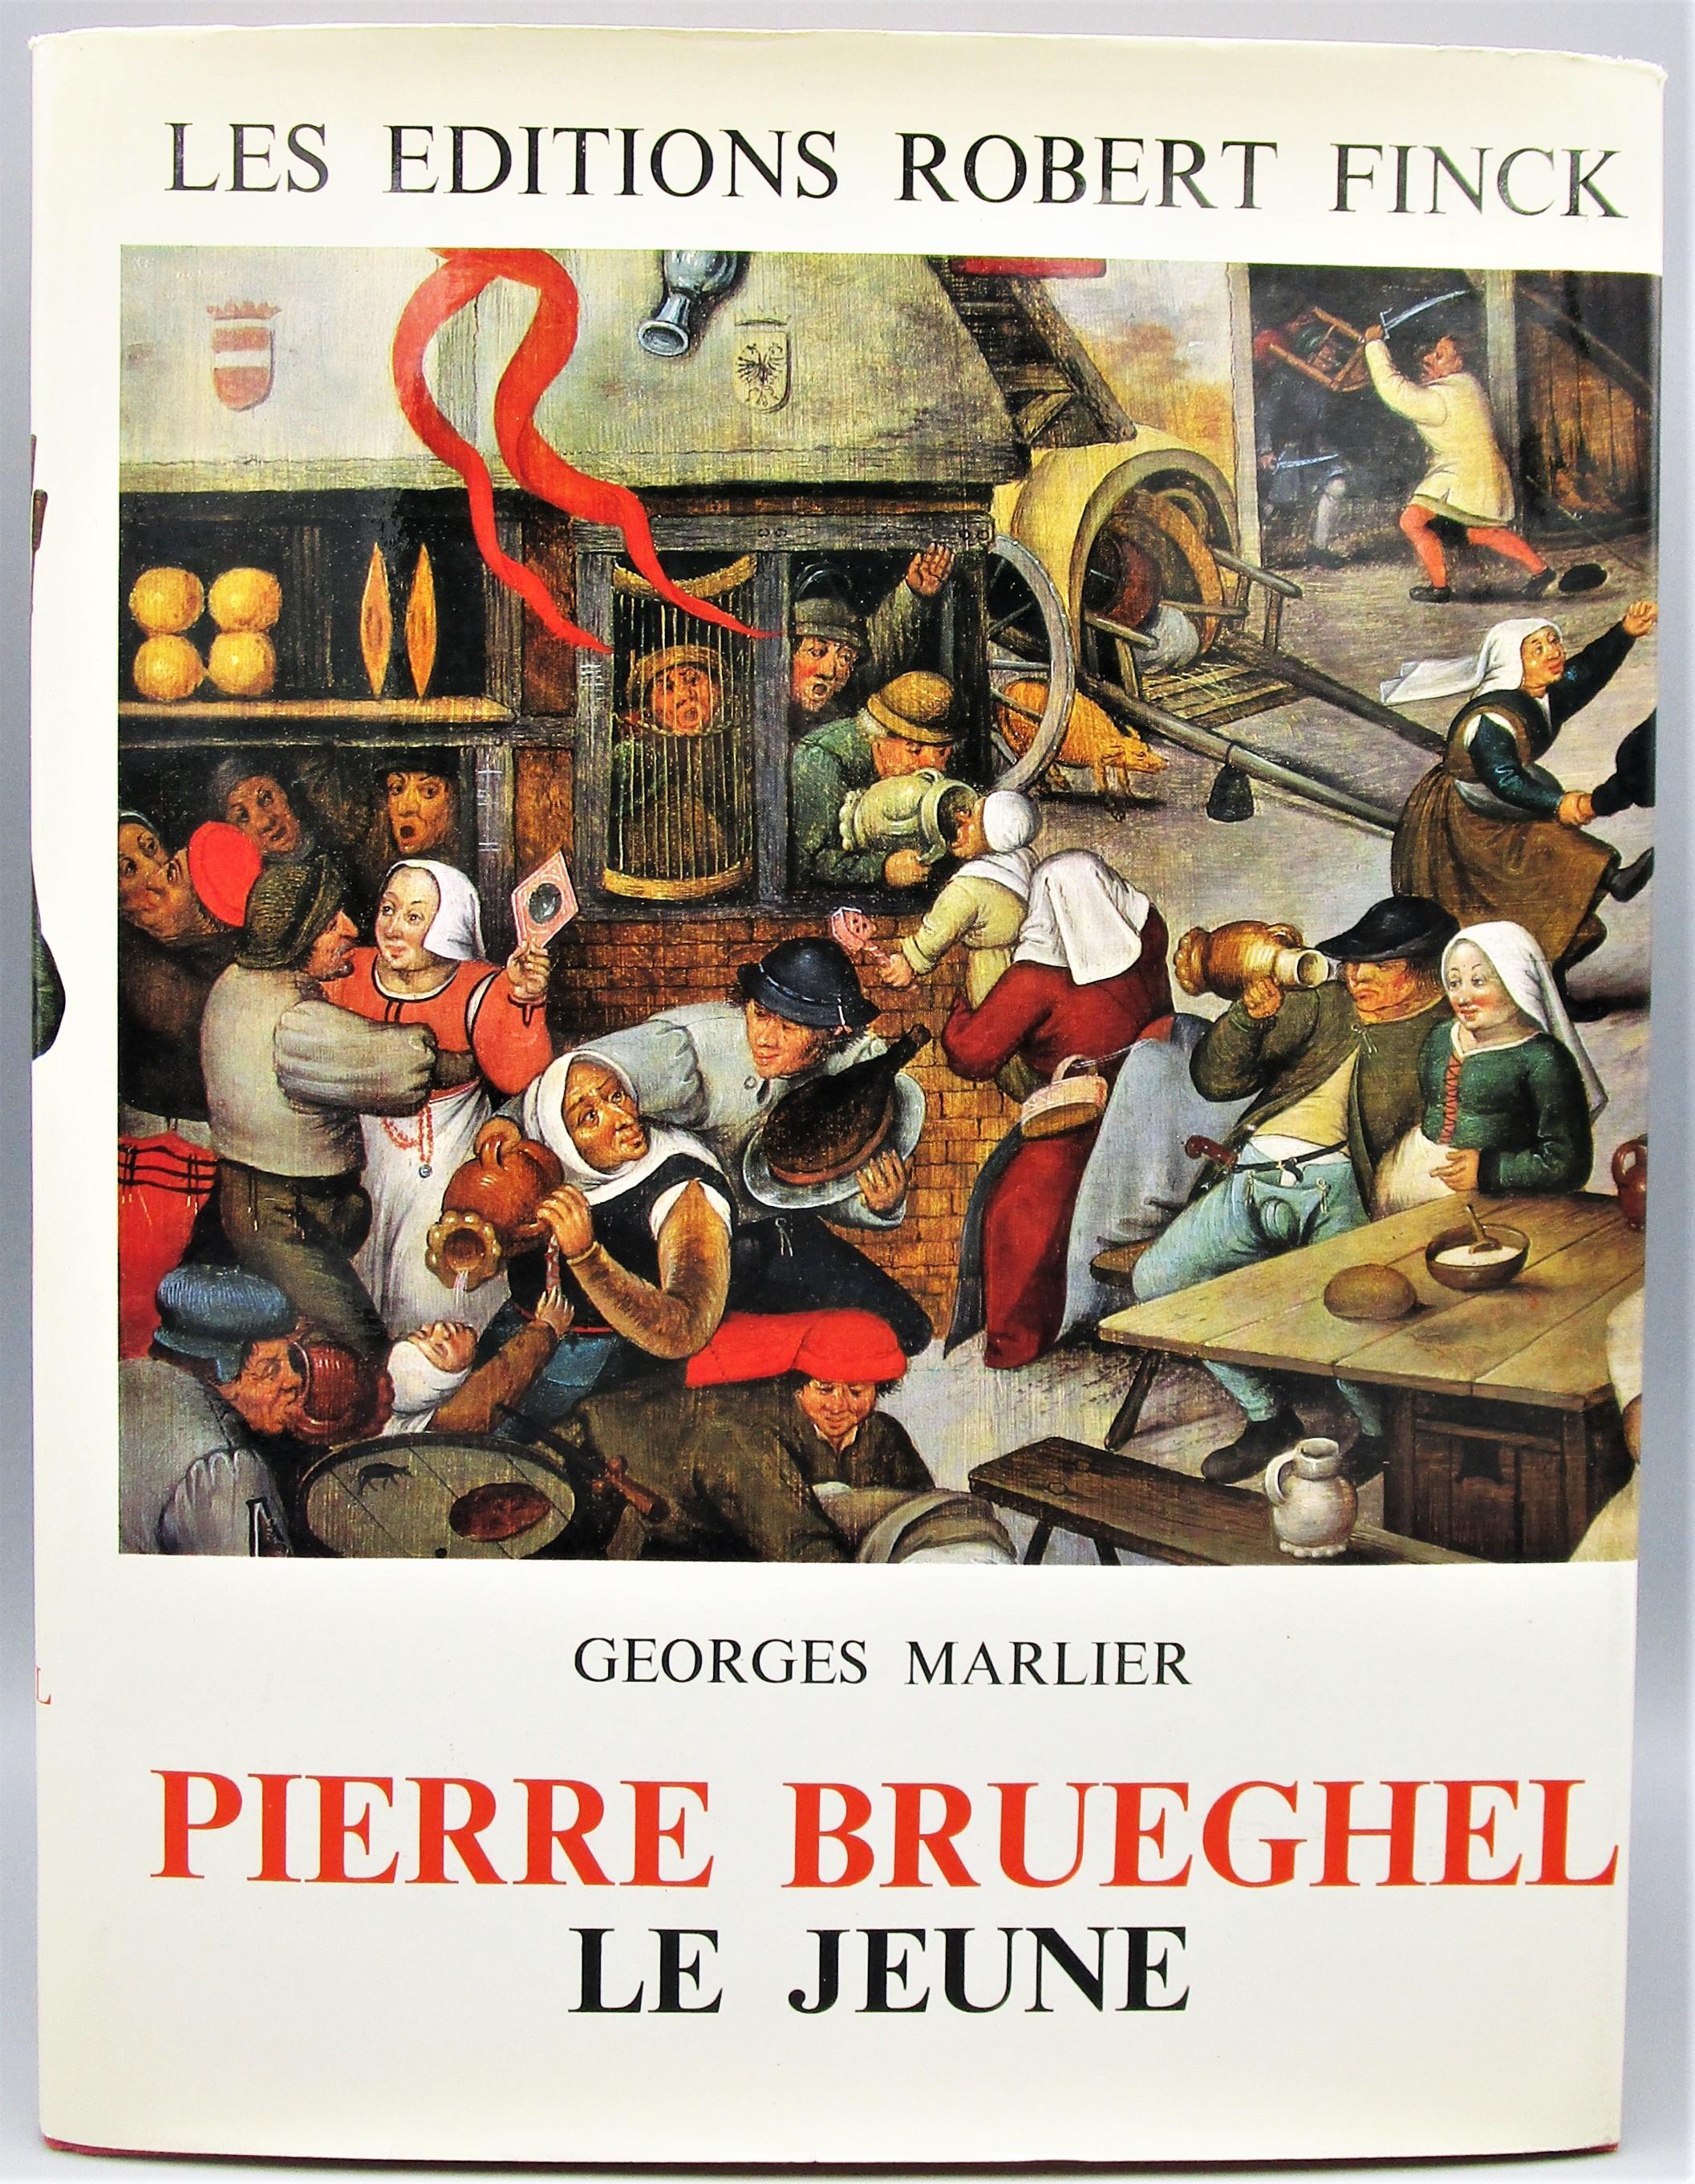 PIERRE BRUEGHEL LE JEUNE, by Georges Marlier - 1969